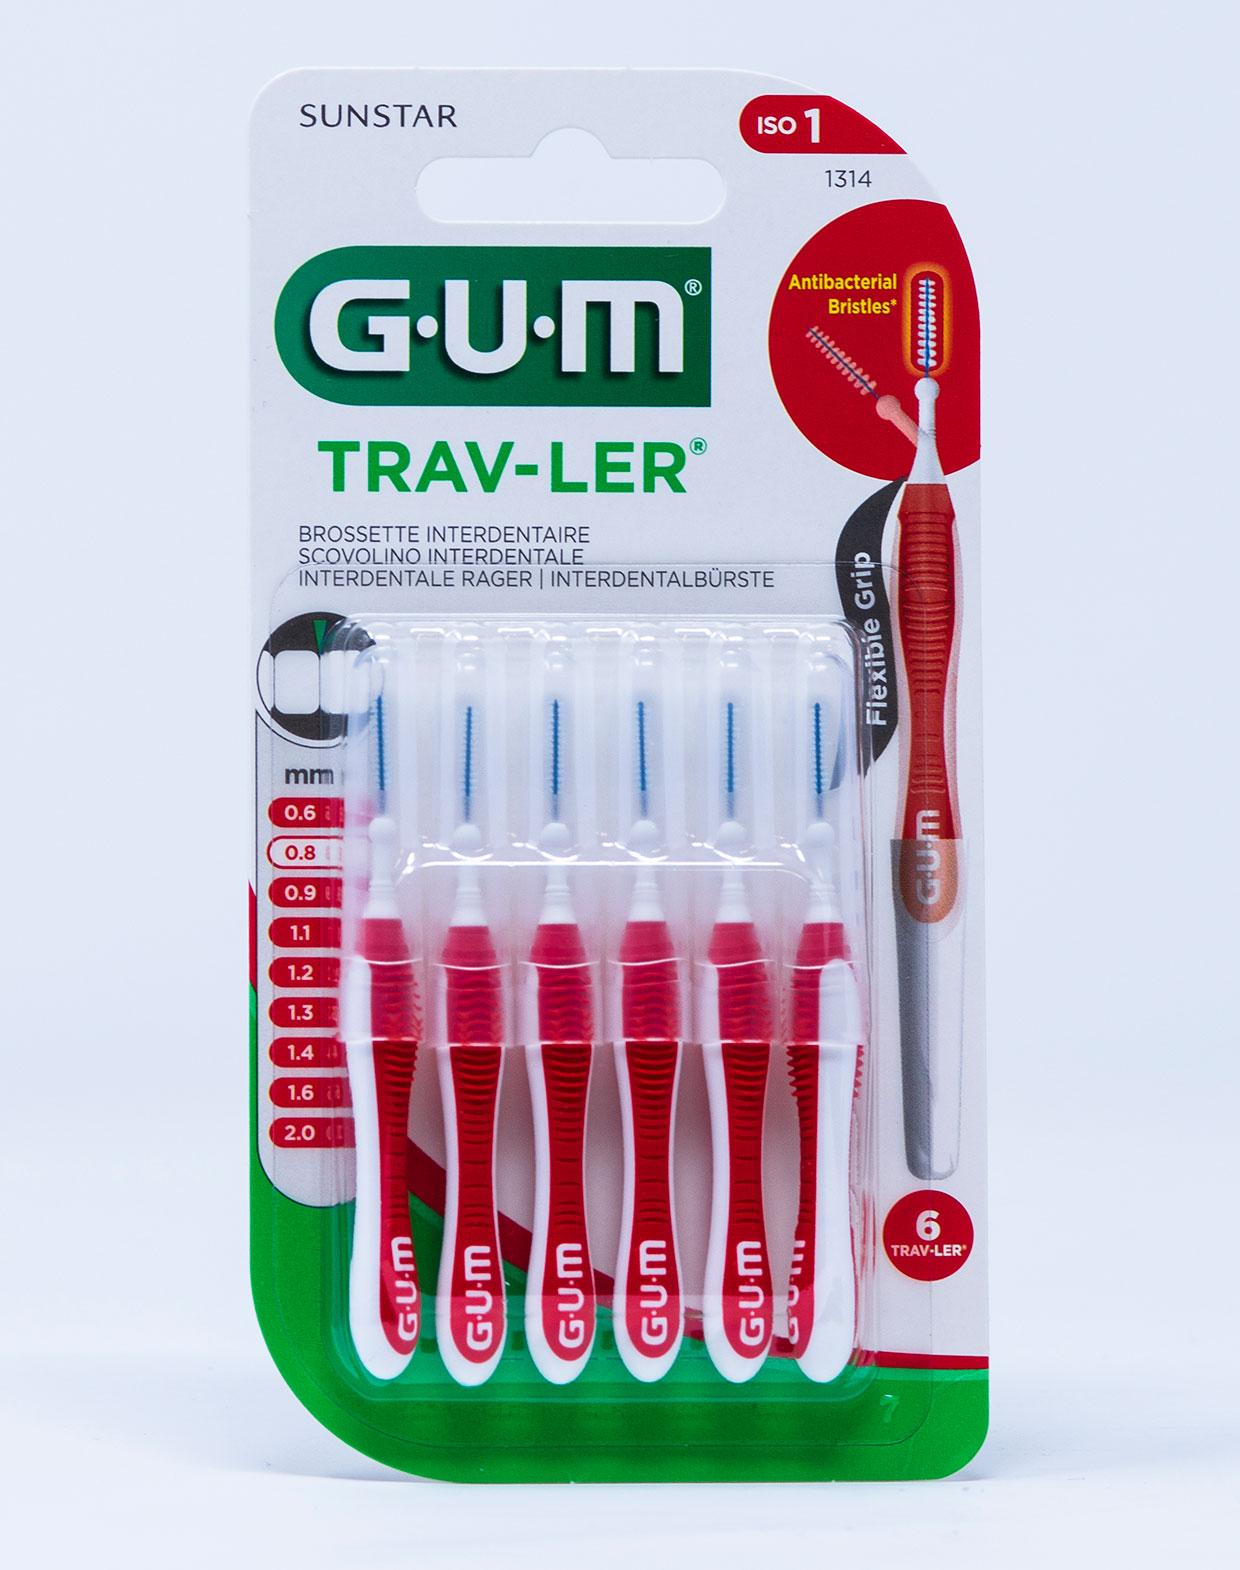 Gum Scovolino Trav-Ler ISO 1 – 0,8 mm | 1314